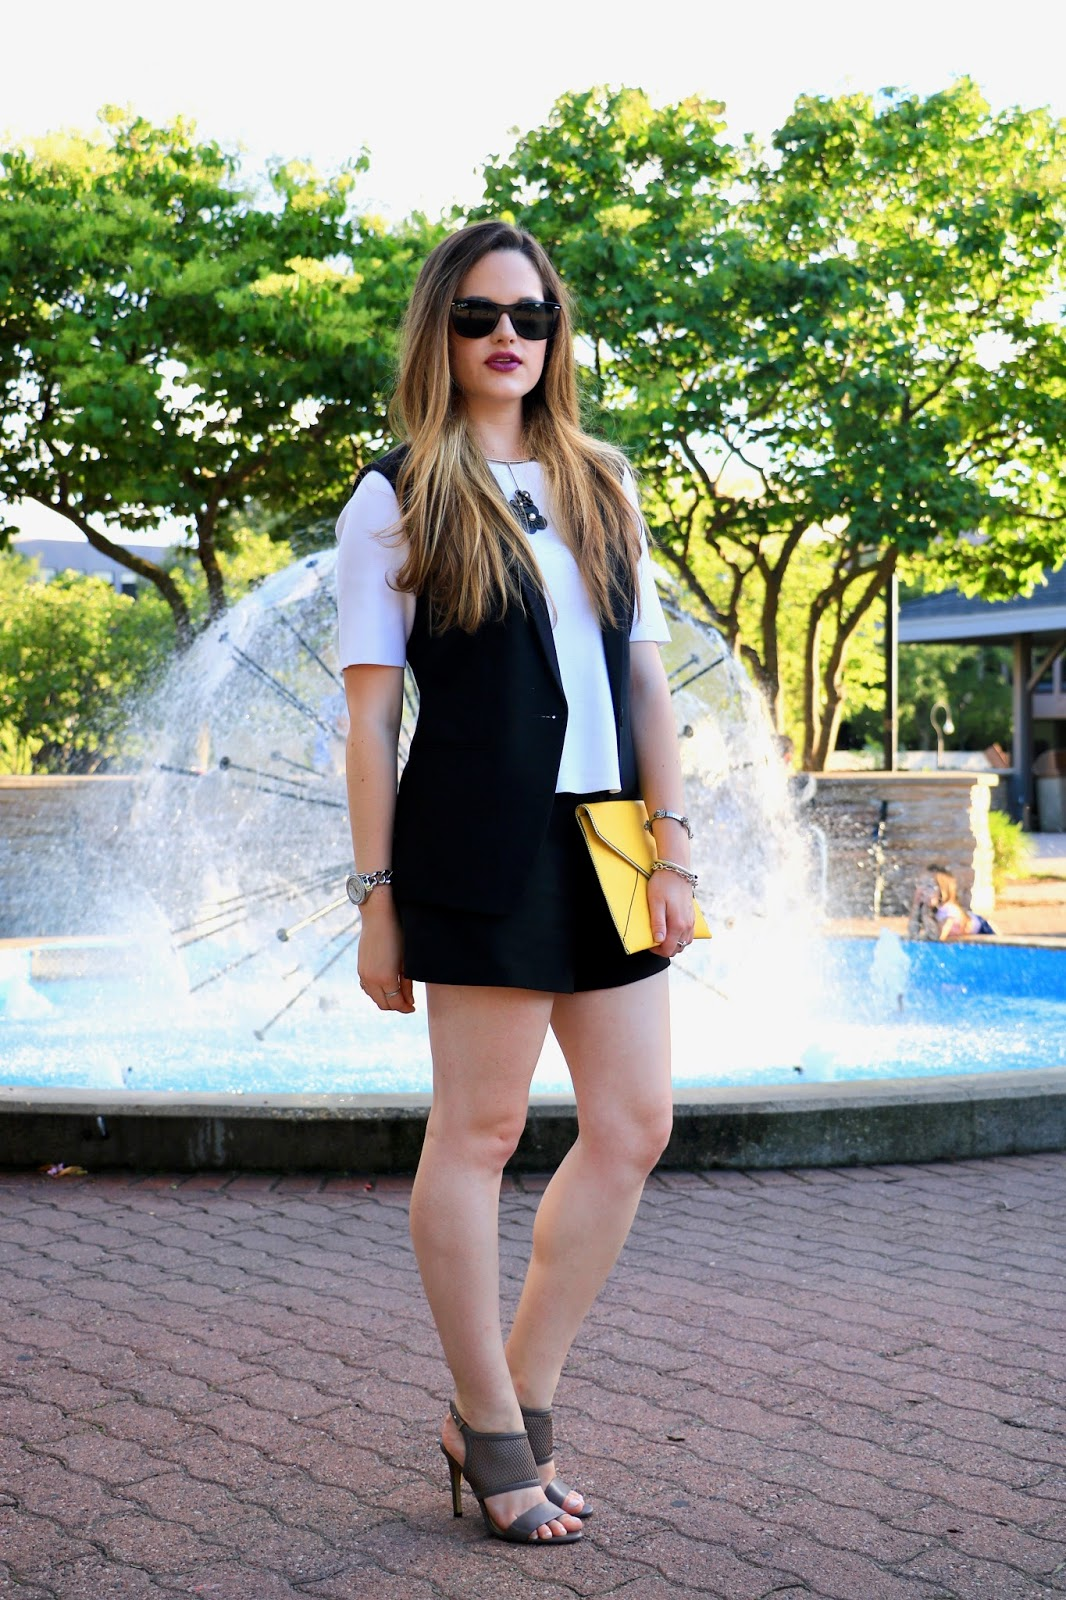 NYC fashion blogger Kathleen Harper of Kat's Fashion Fix summer street style